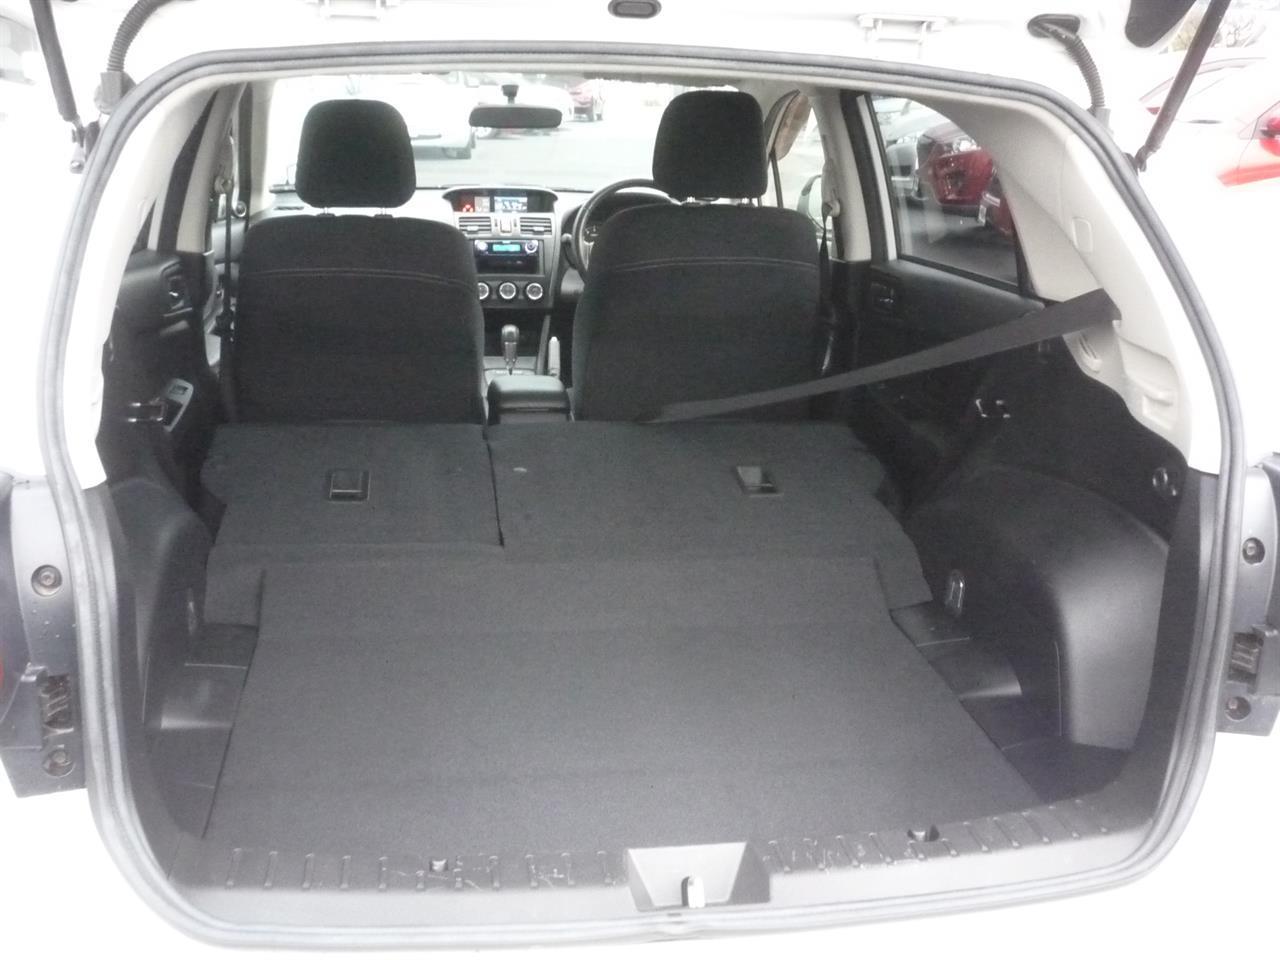 image-15, 2012 Subaru Impreza 1.6i-L 2WD at Dunedin